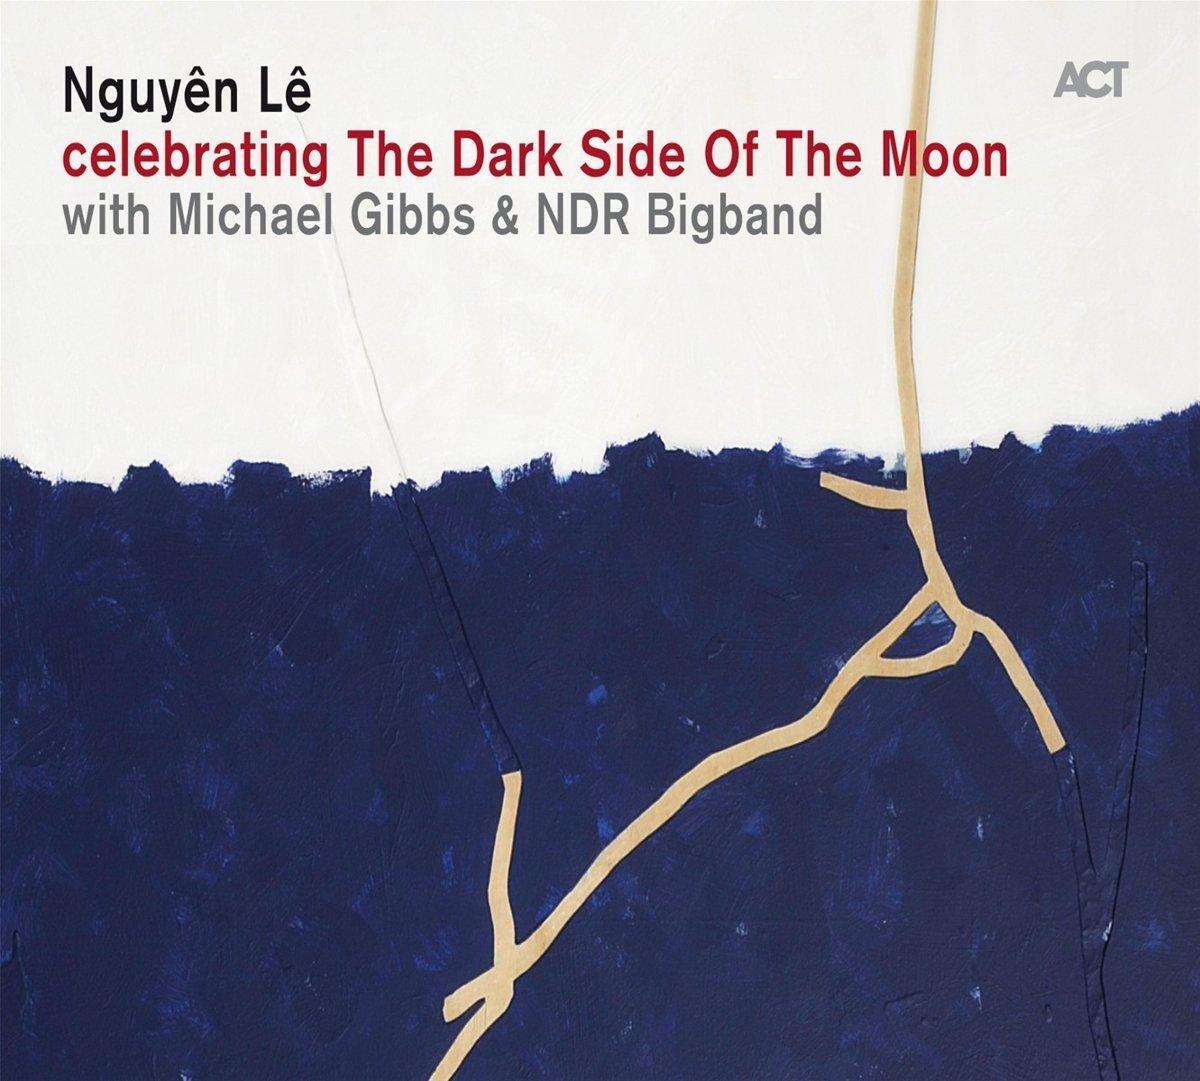 Celebrating the dark side of the moon [enr. sonore] / Nguyên Lê.-